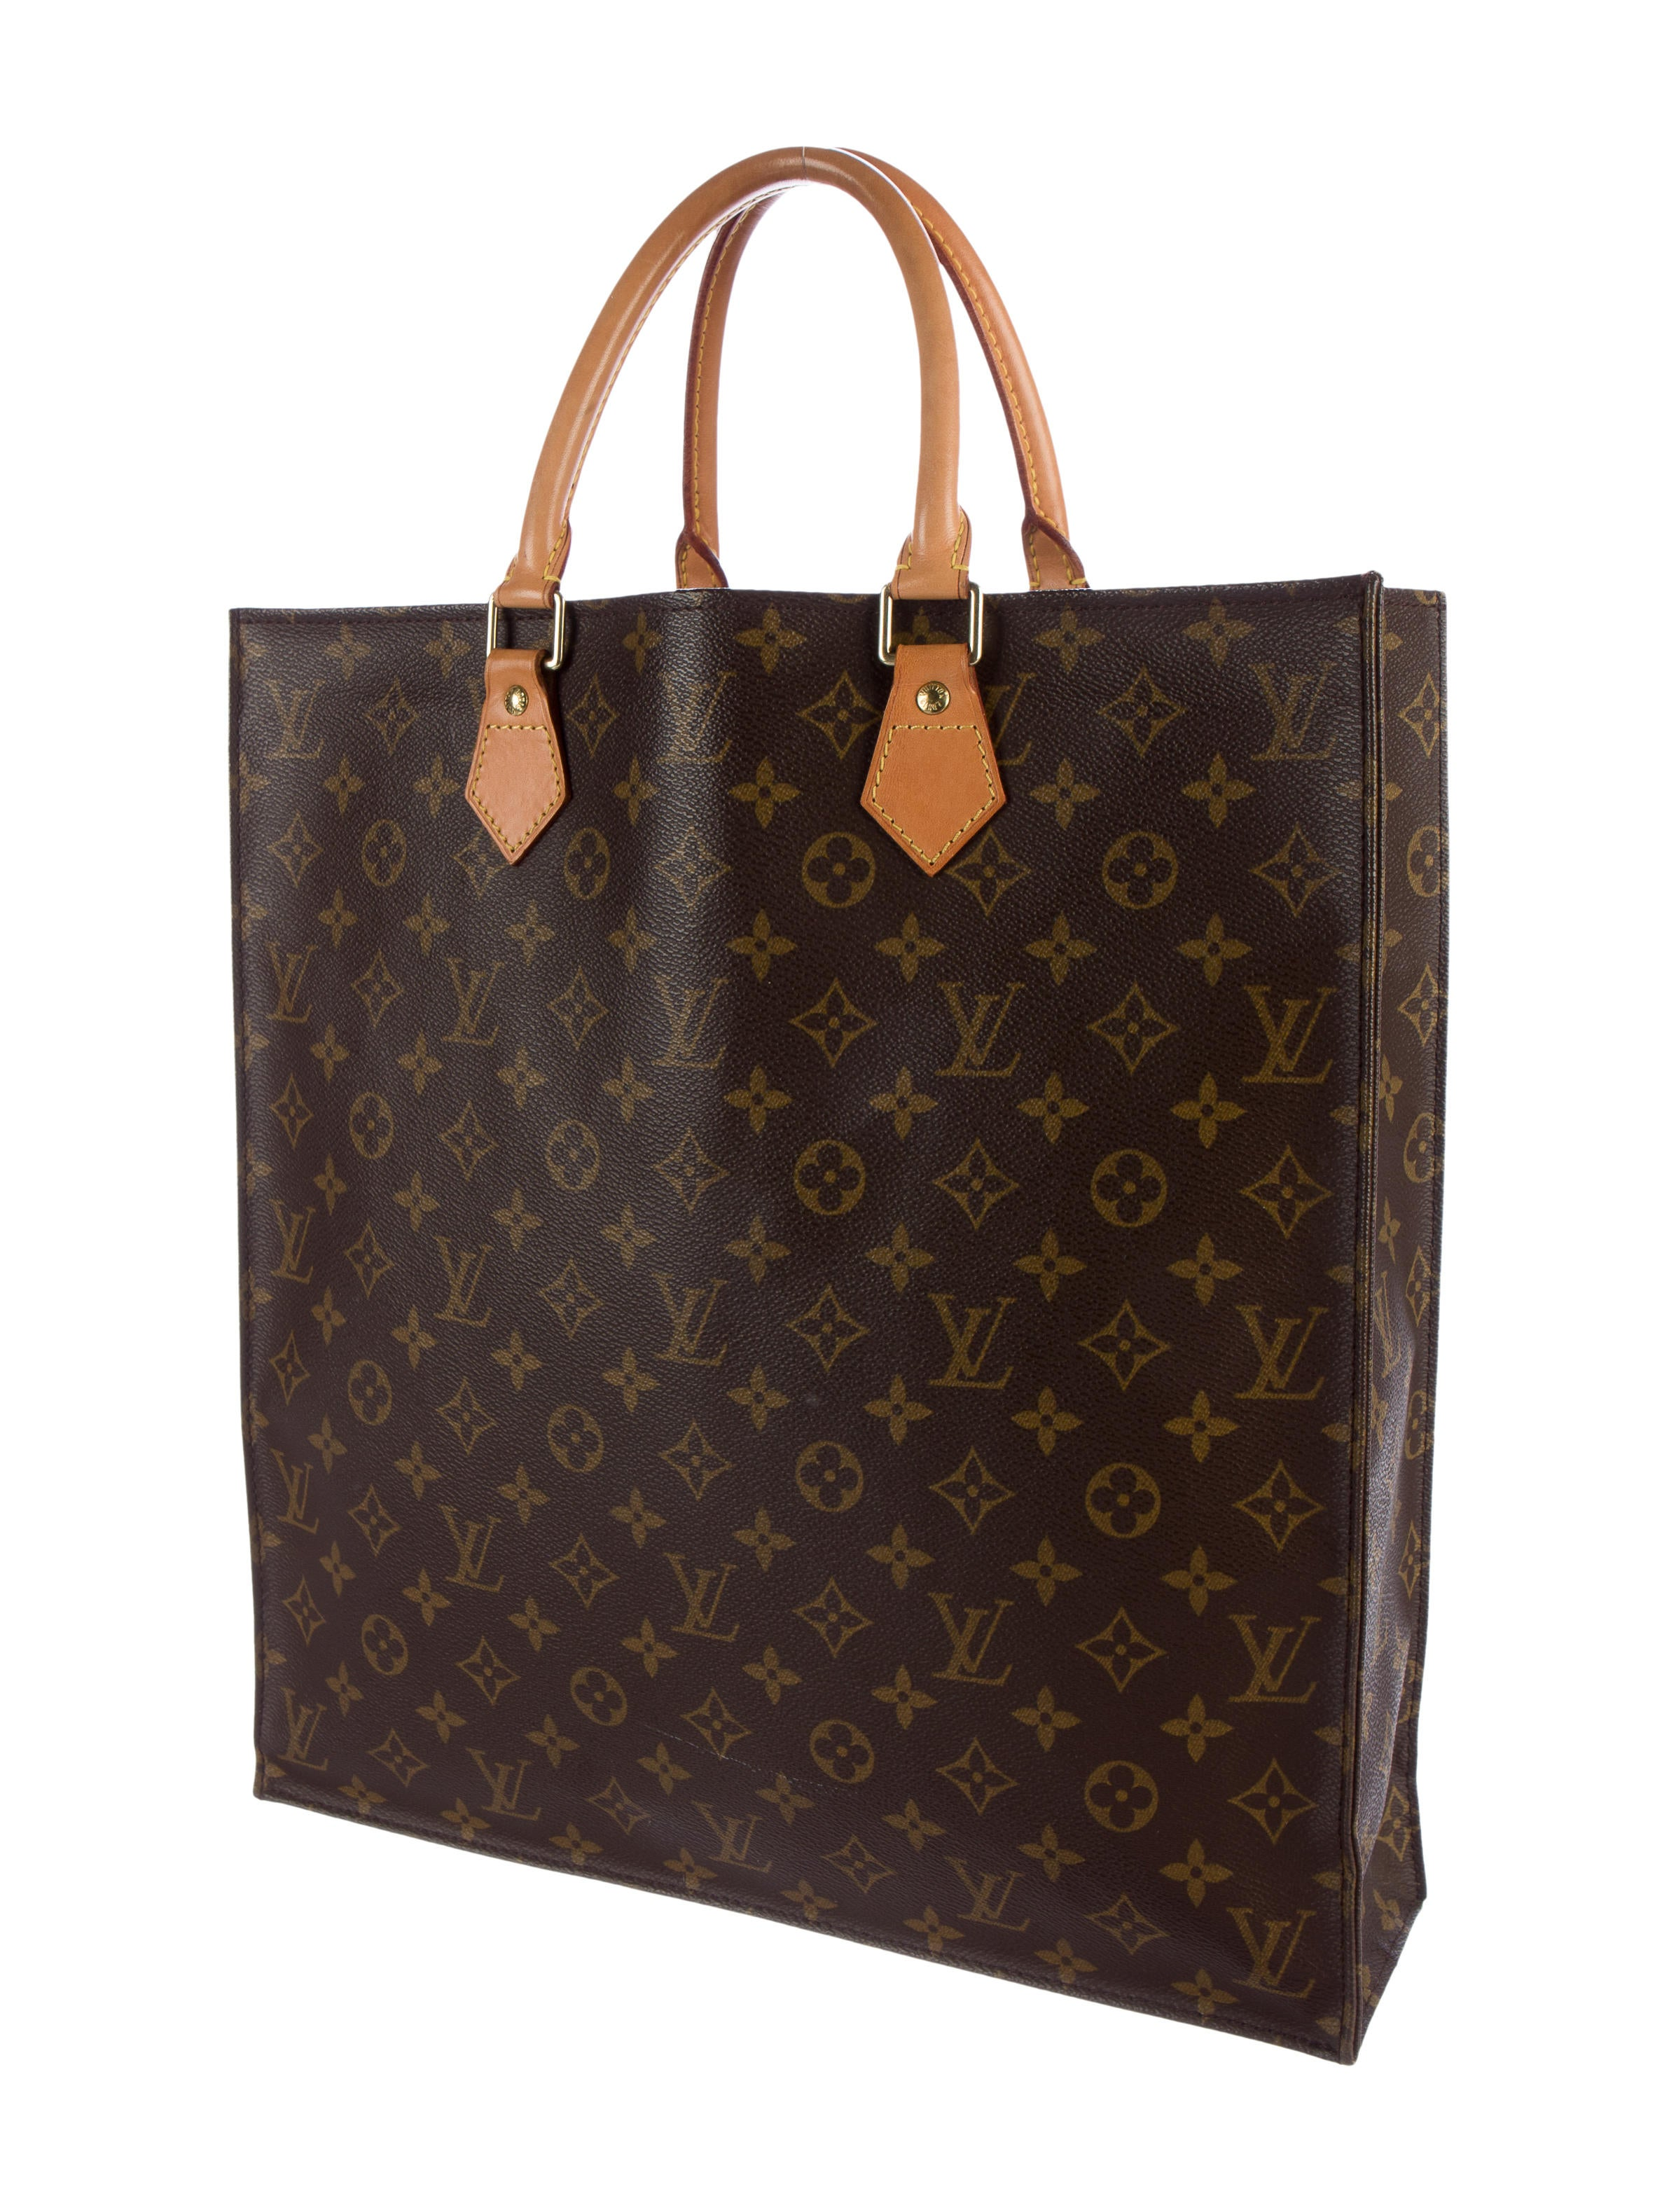 Sac Louis Vuitton Matelassé : Louis vuitton monogram sac plat handbags lou